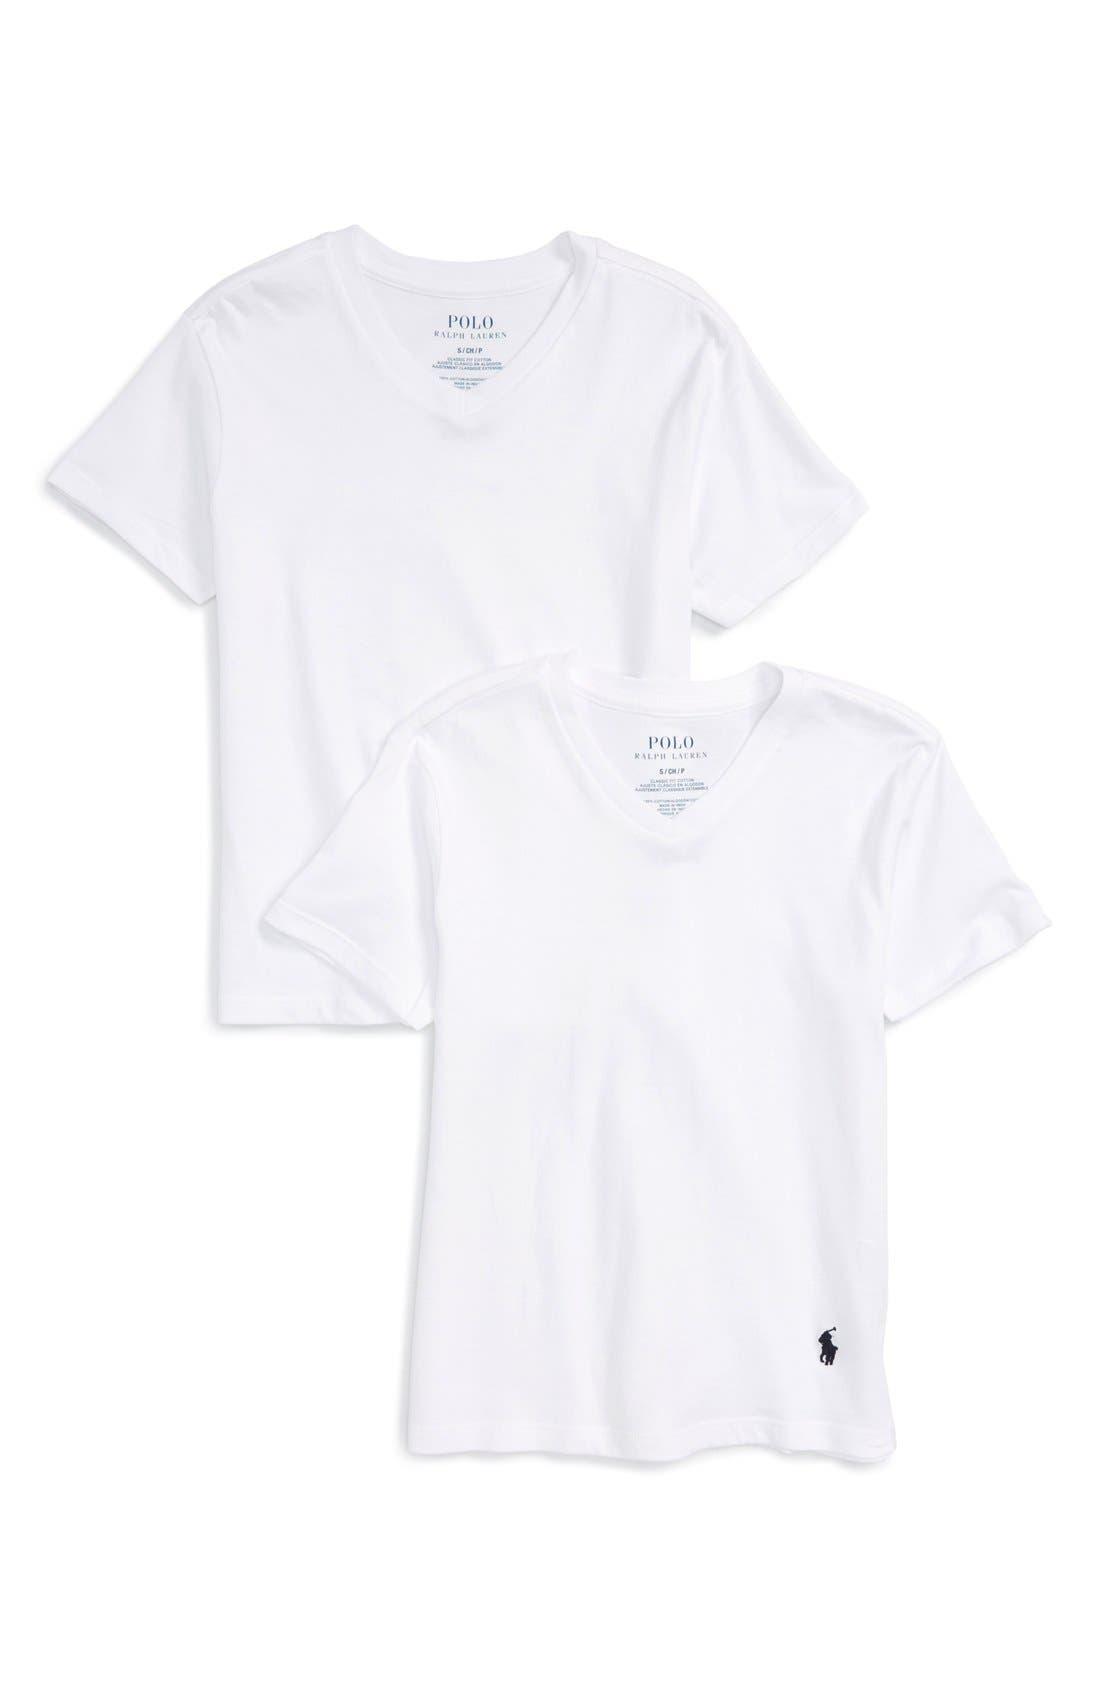 POLO RALPH LAUREN,                             V-Neck T-Shirts,                             Main thumbnail 1, color,                             100